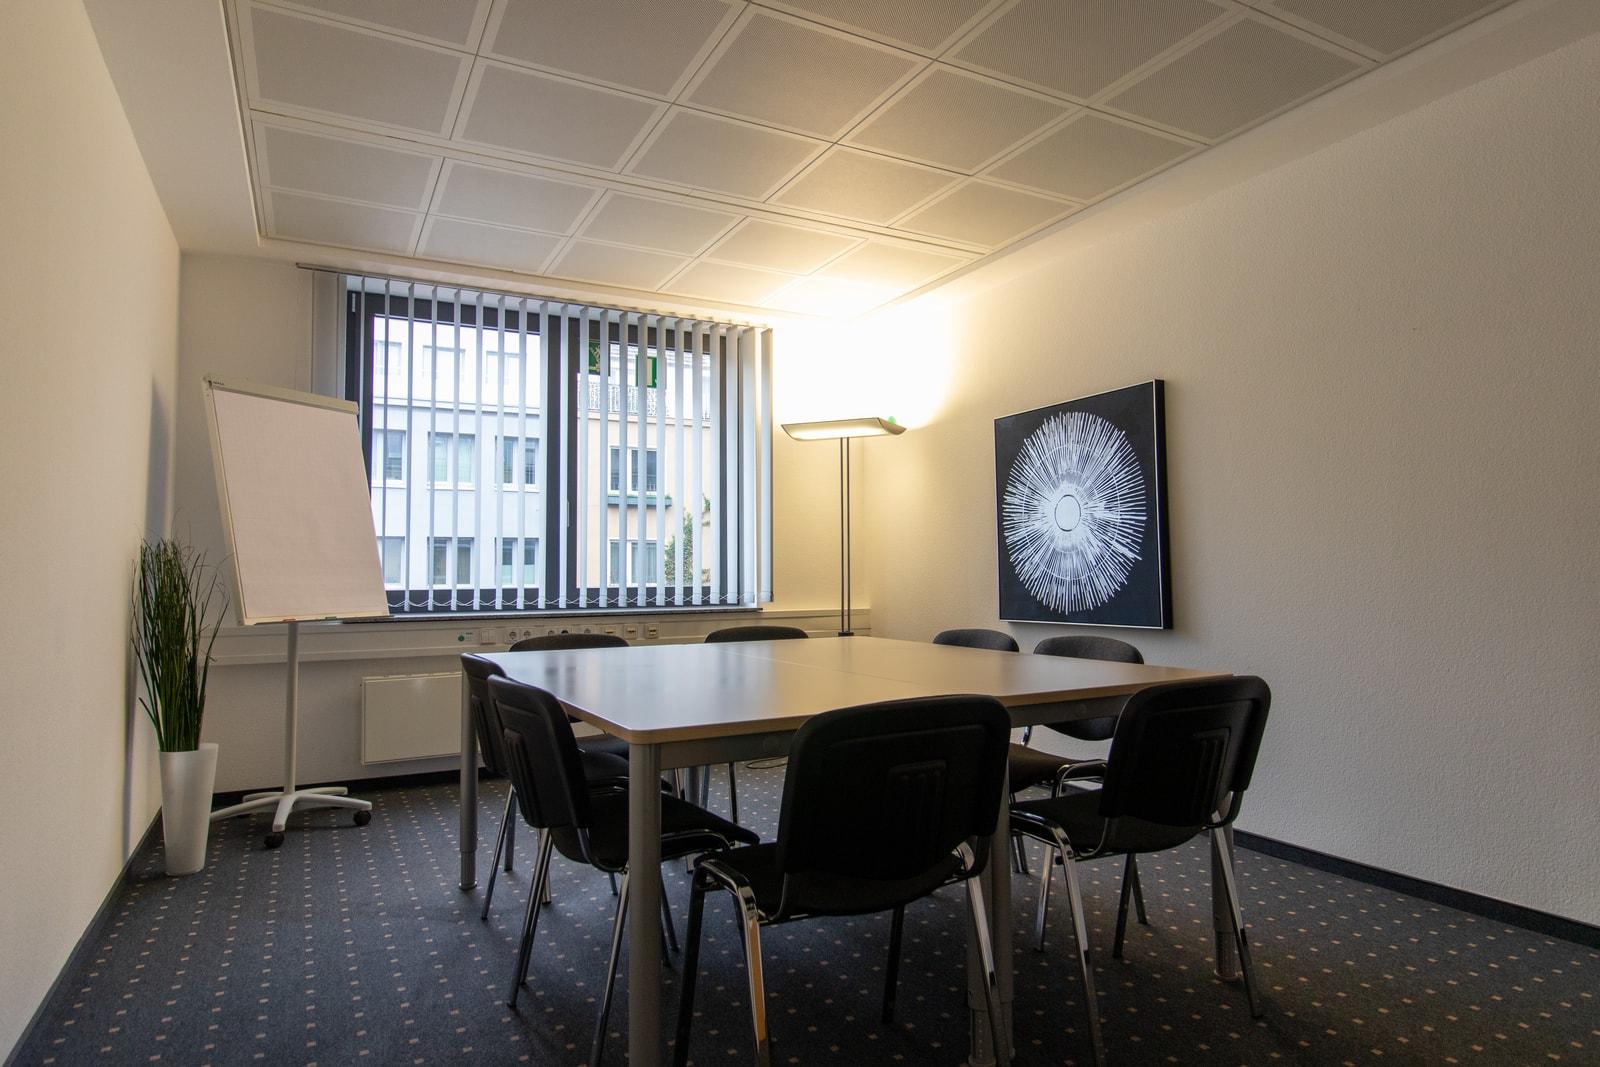 meeting room 2 oststrasse 54